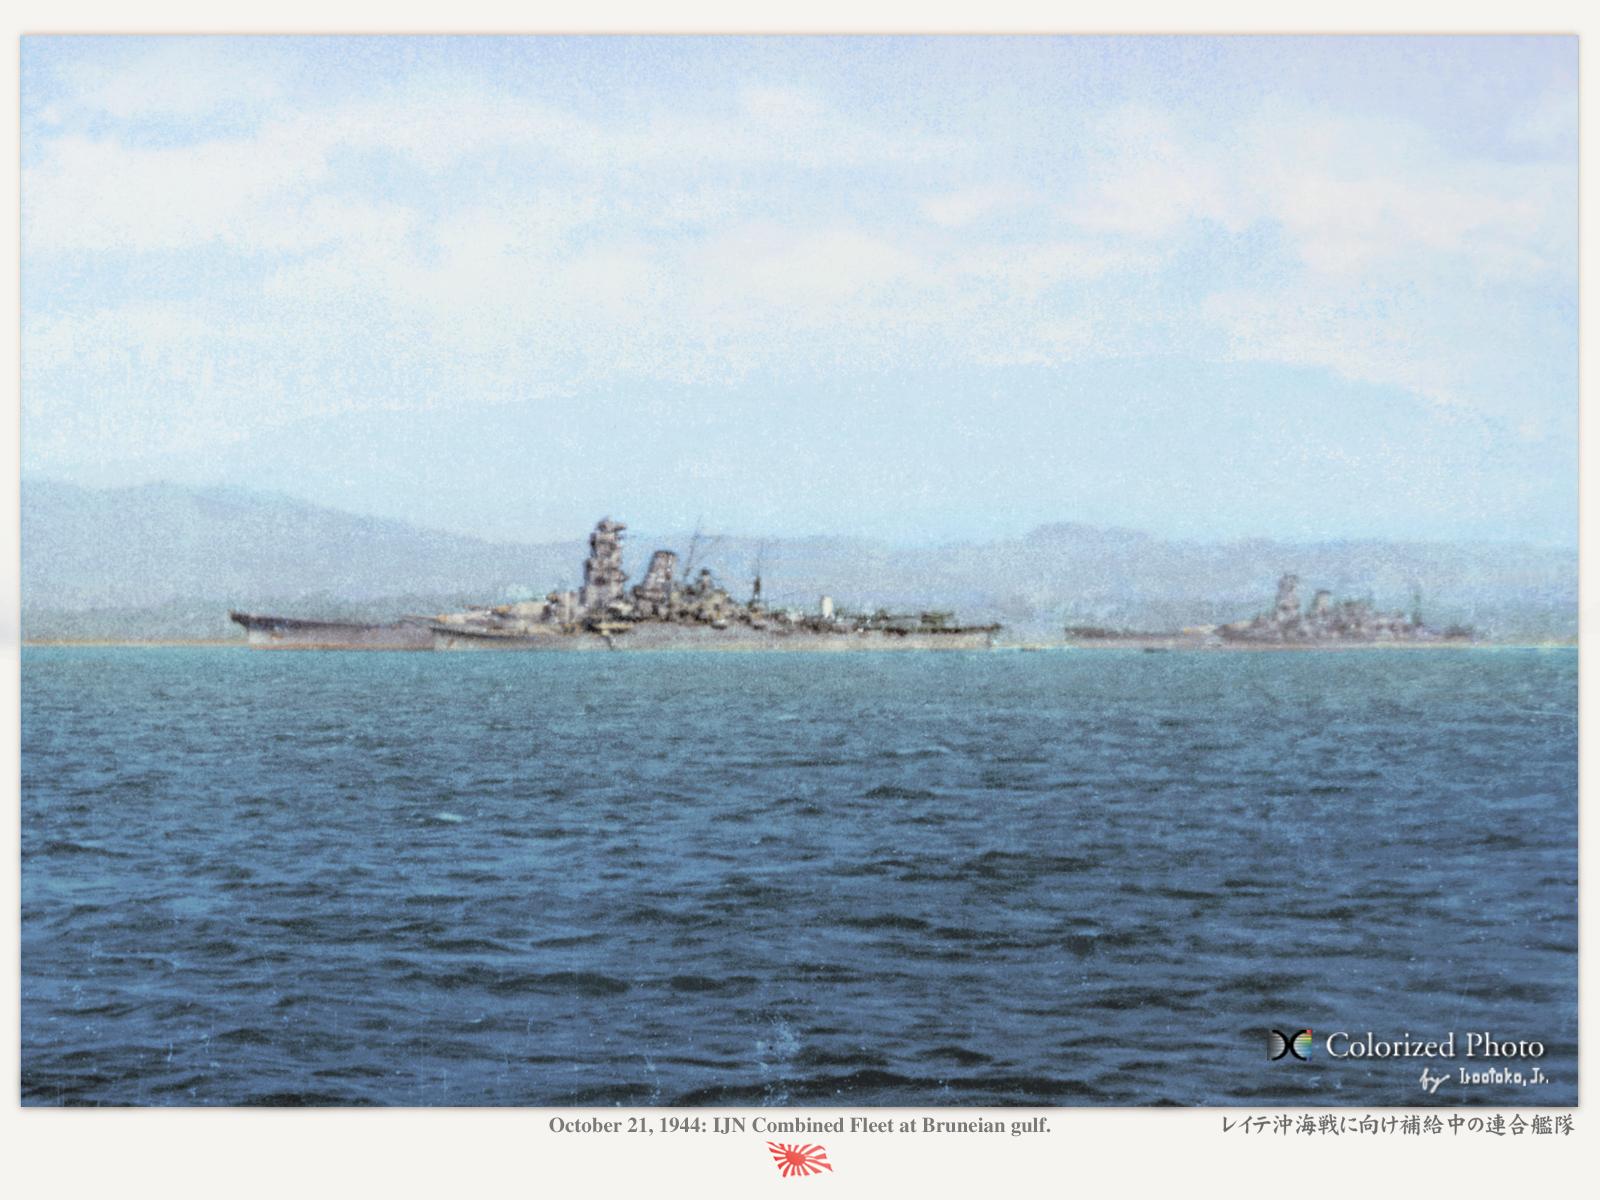 戦艦 大和型 Yamato Class Battleships Monochrome Specter